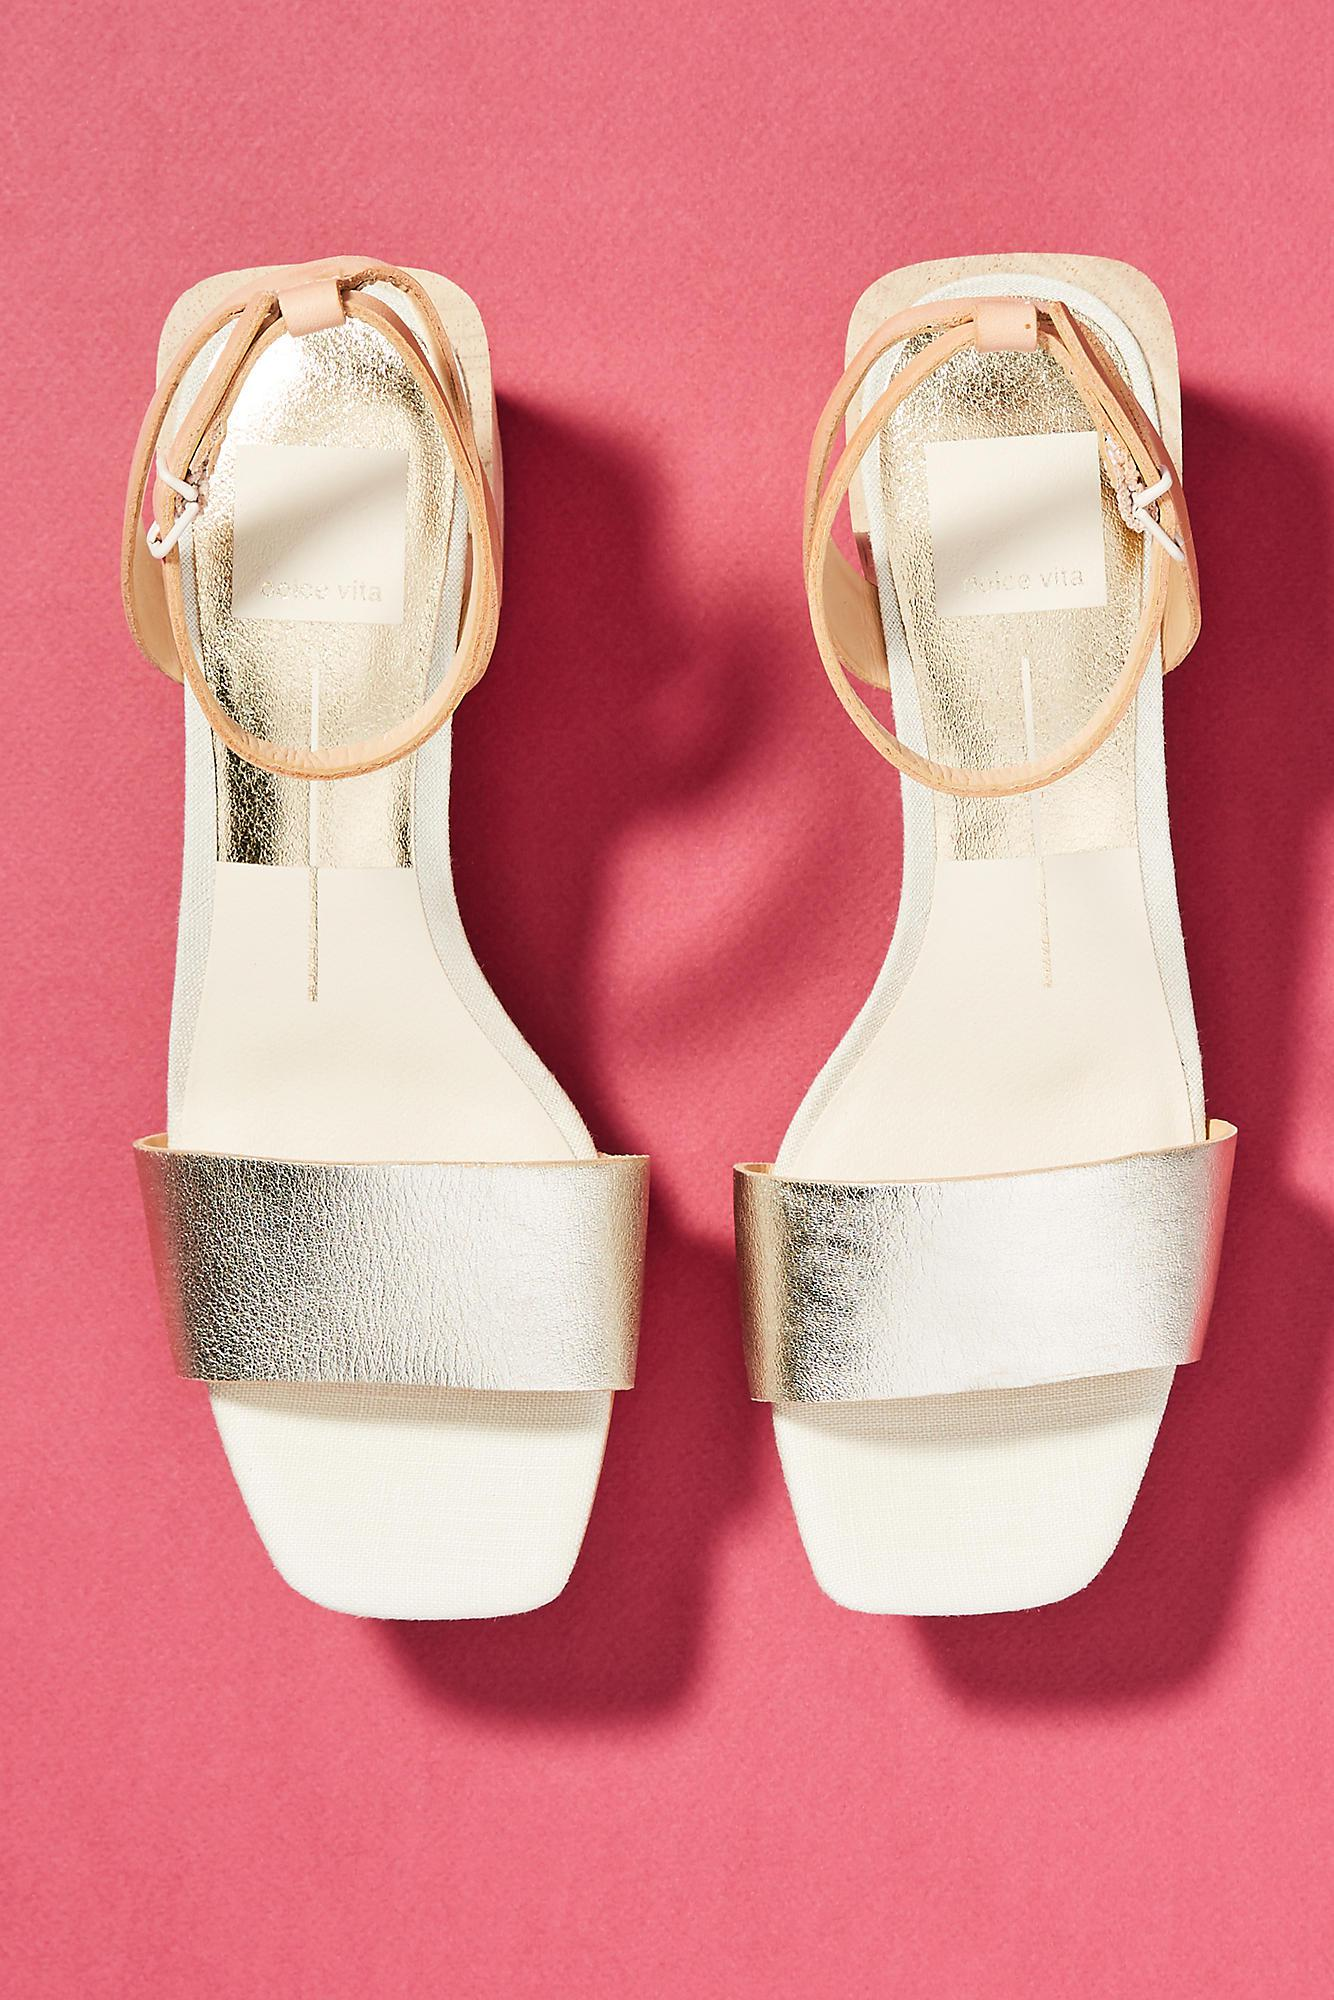 59cd5a3e519 Dolce Vita - Multicolor Zarita Block-heeled Sandals - Lyst. View Fullscreen